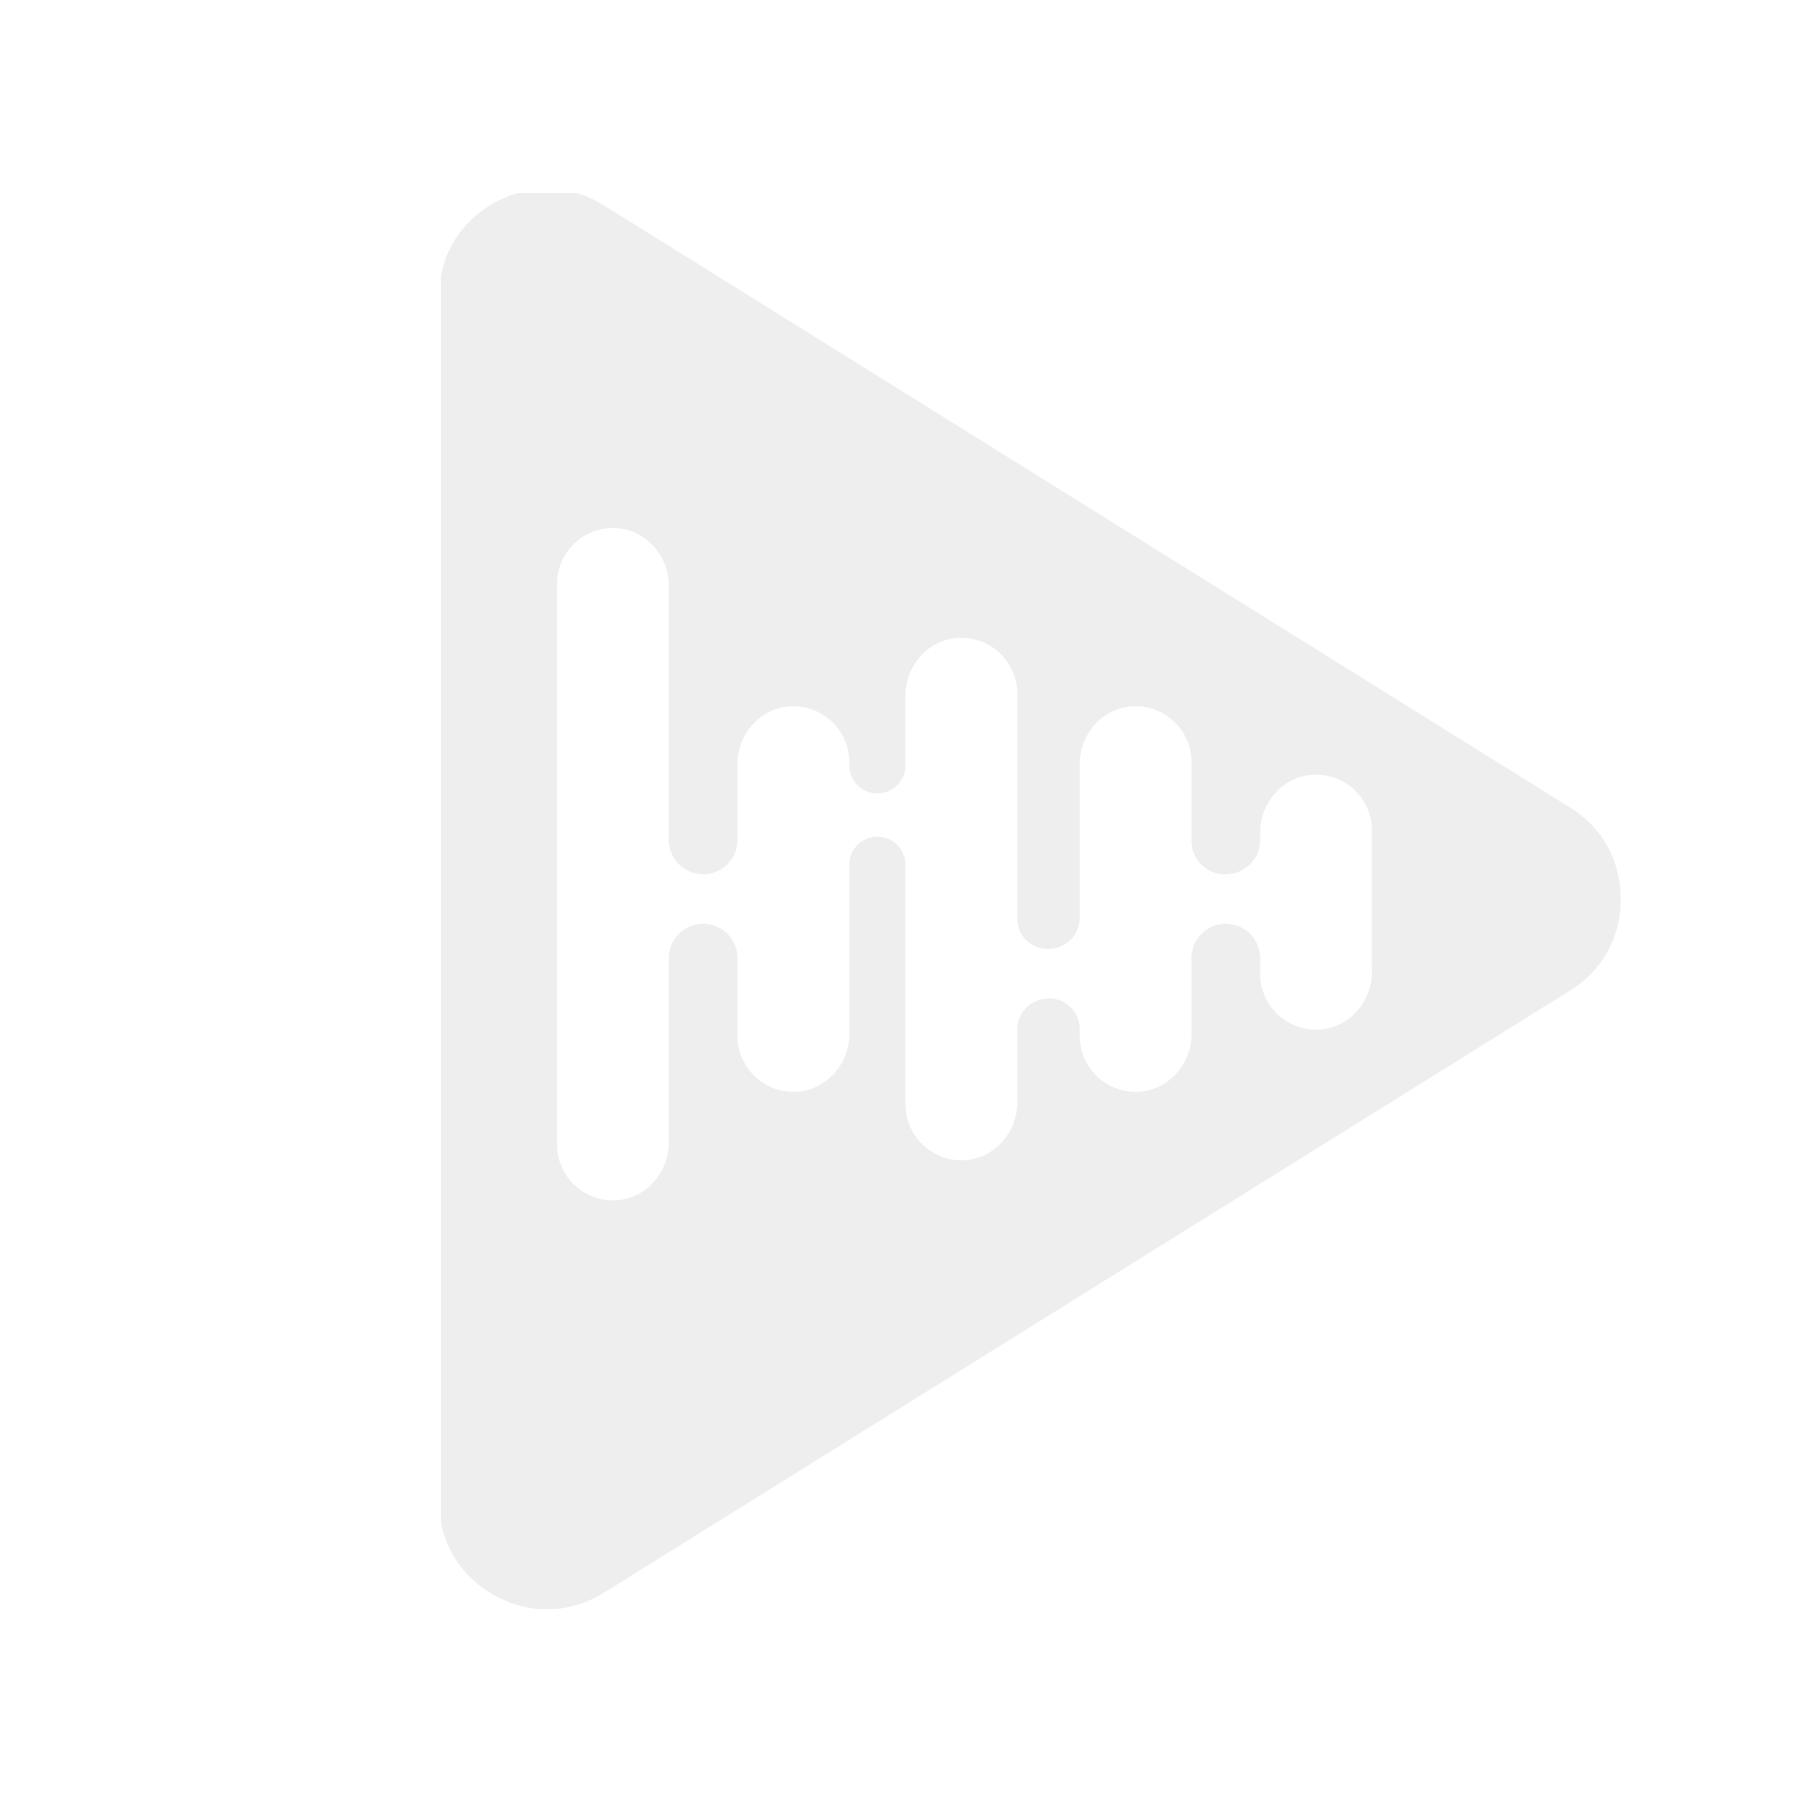 Connect CT-BC - Bananplugger, gullbelagt, kobber